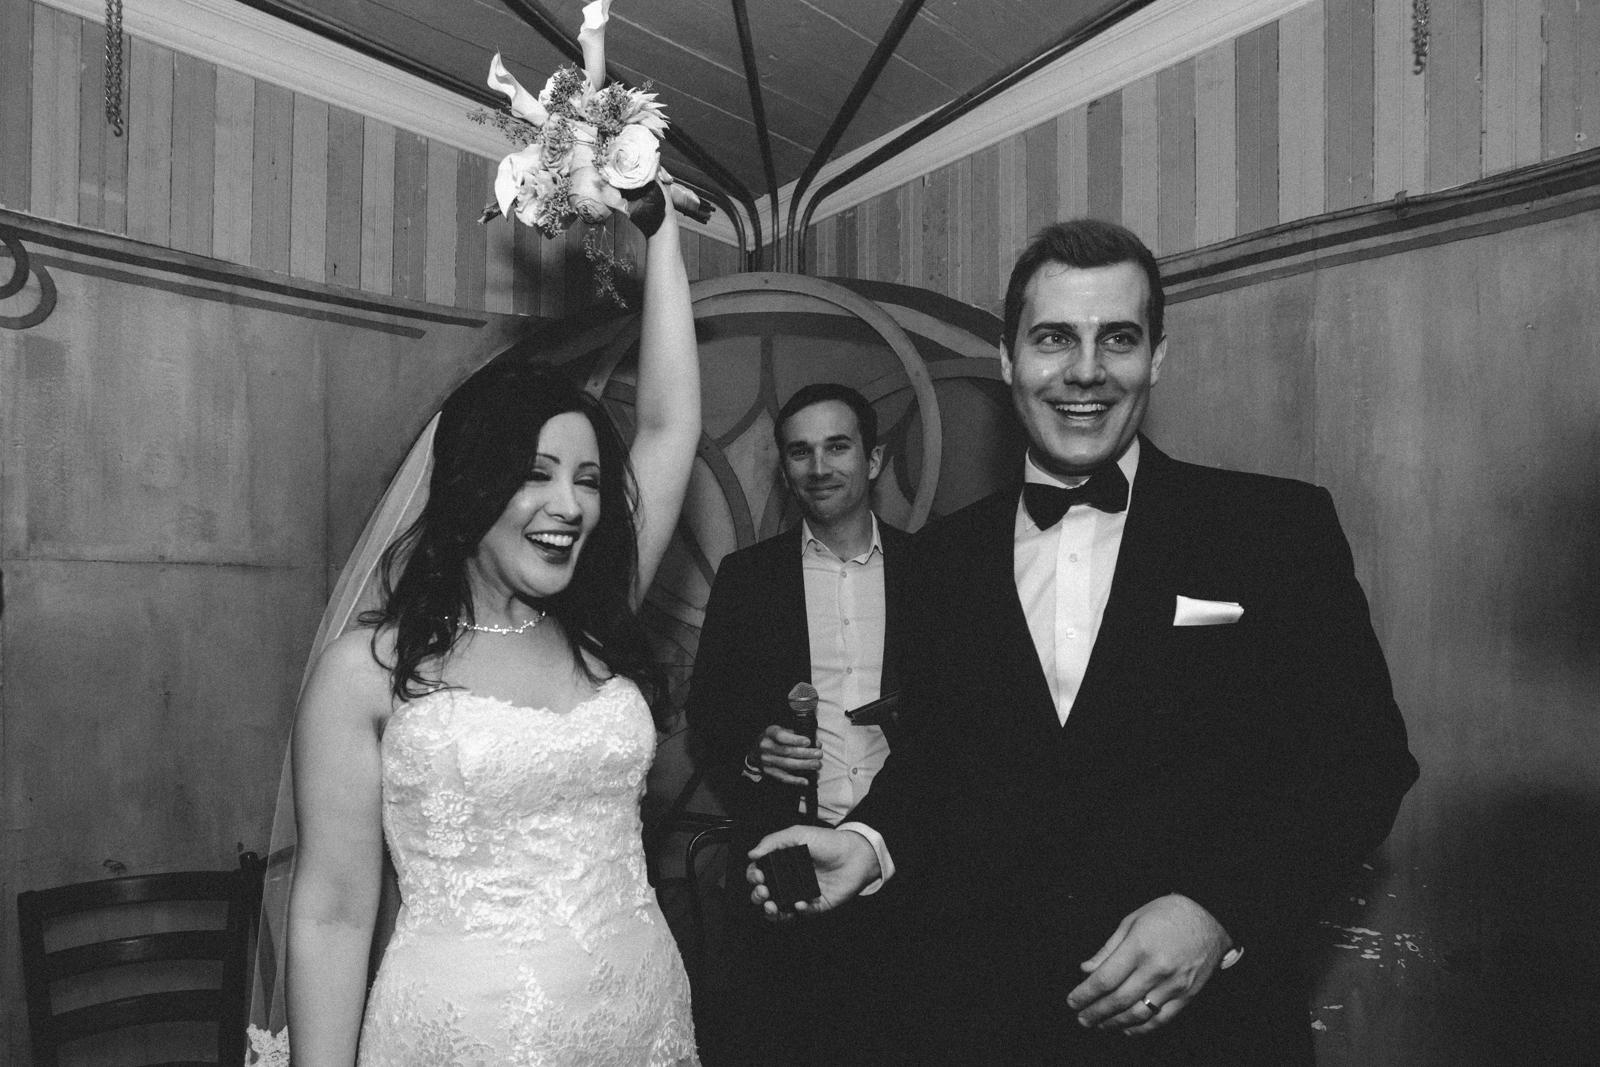 NYC Wedding Photography Lofts at Prince Brooklyn NYC Photographer Boris Zaretsky _B2C0922.jpg